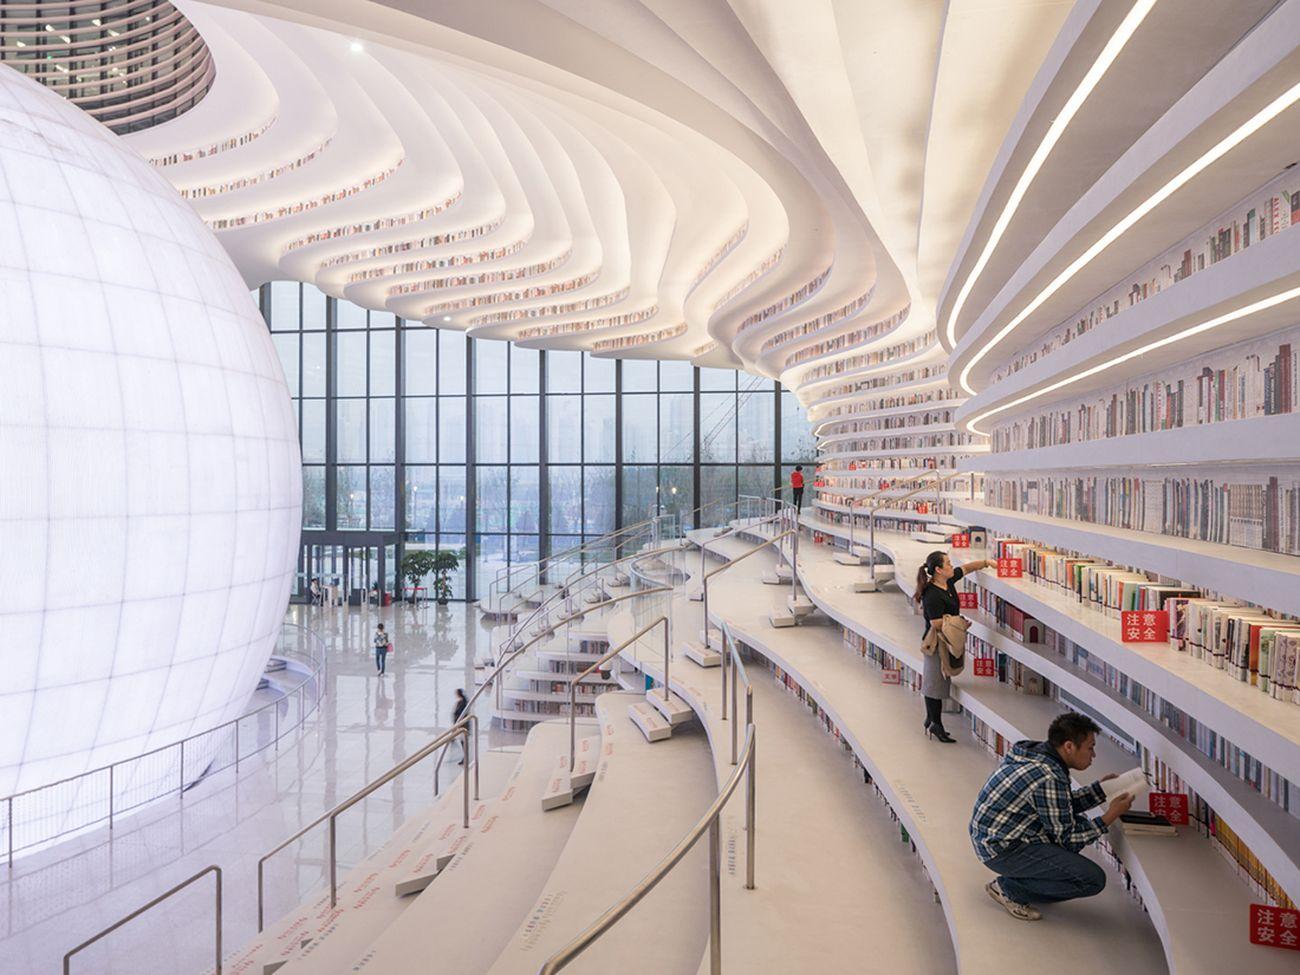 MVRDV, Tianjin Binhai Library, Tianjin, Cina. Courtesy Photo © Ossip van Duivenbode